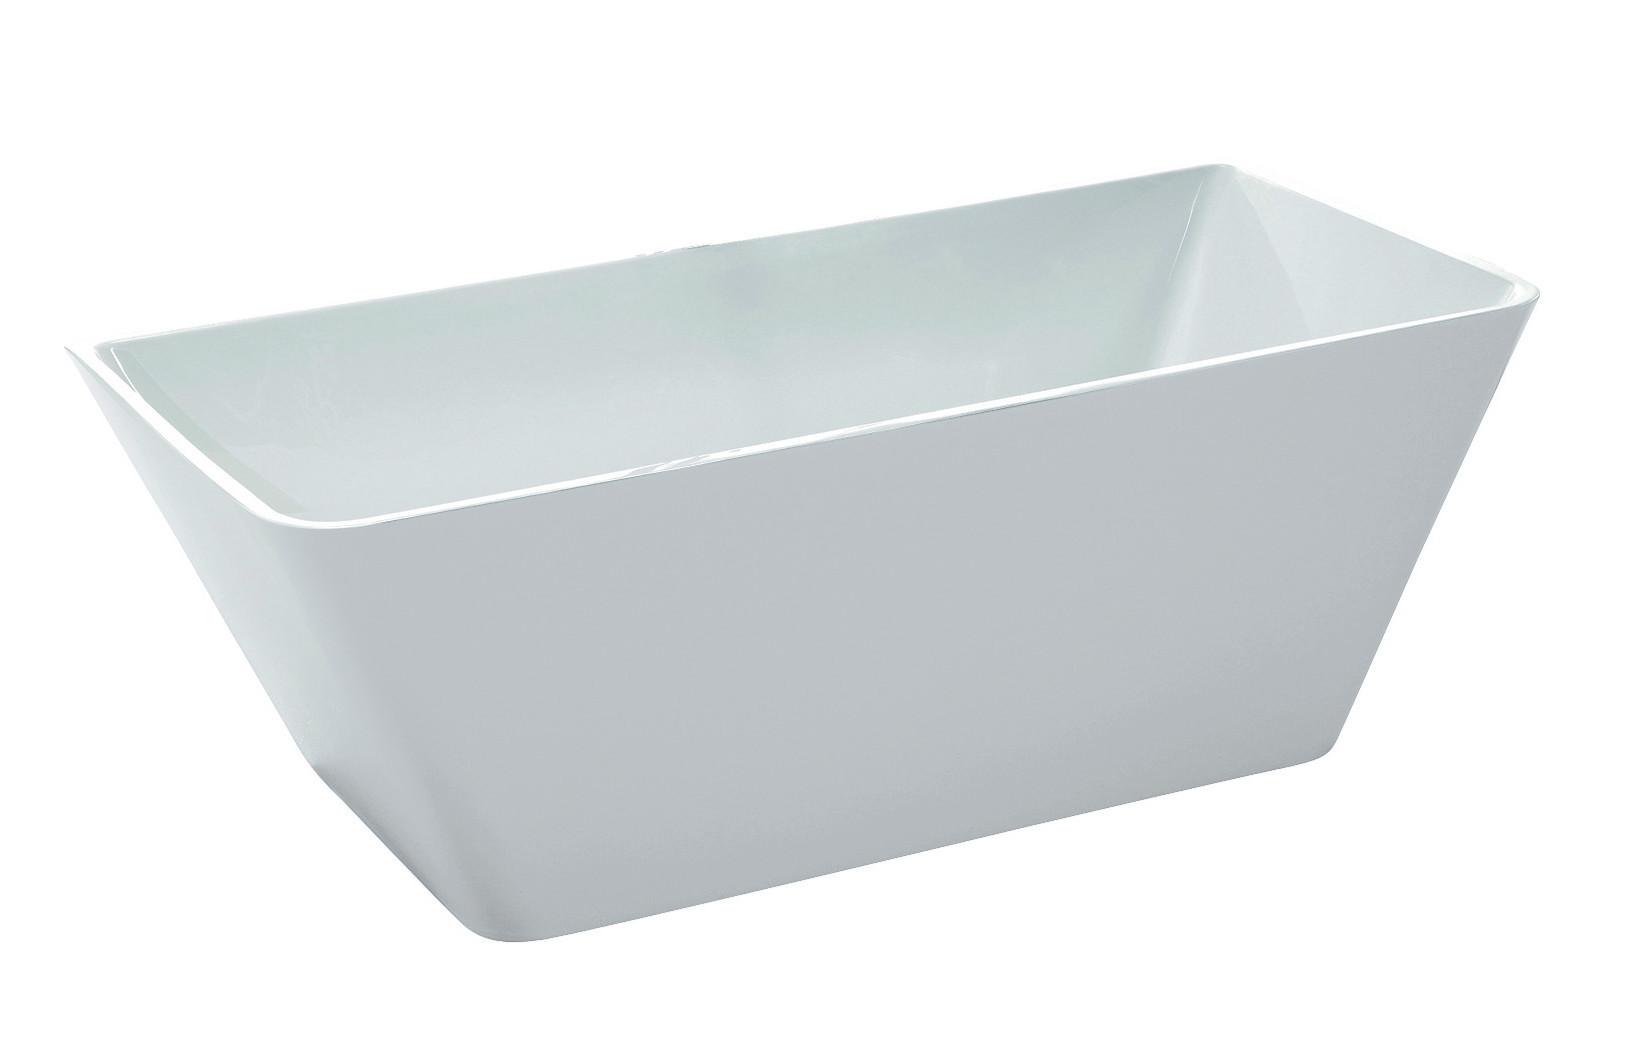 Anzzi FT-AZ099 Zenith Series 5.58 ft. Freestanding Bathtub in White